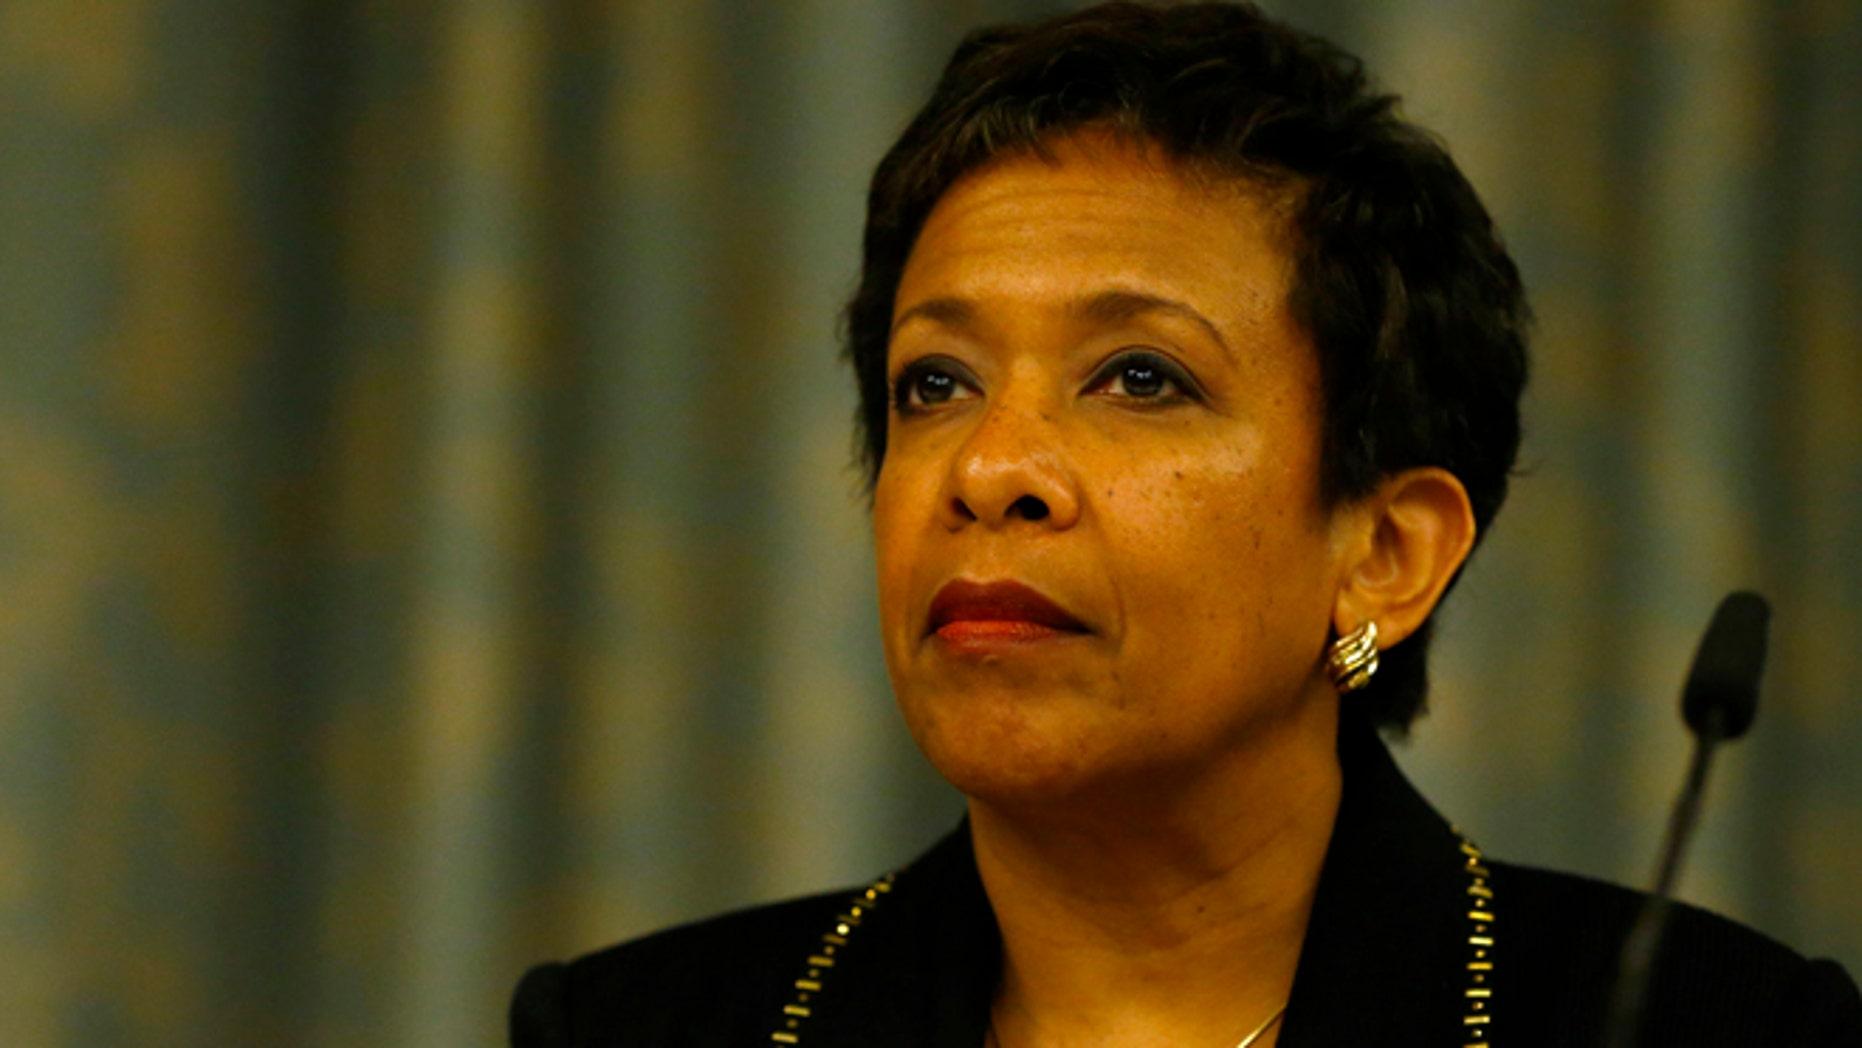 Sept. 14, 2015: U.S. Attorney General Loretta Lynch attends a news conference on Swiss criminal proceedings.